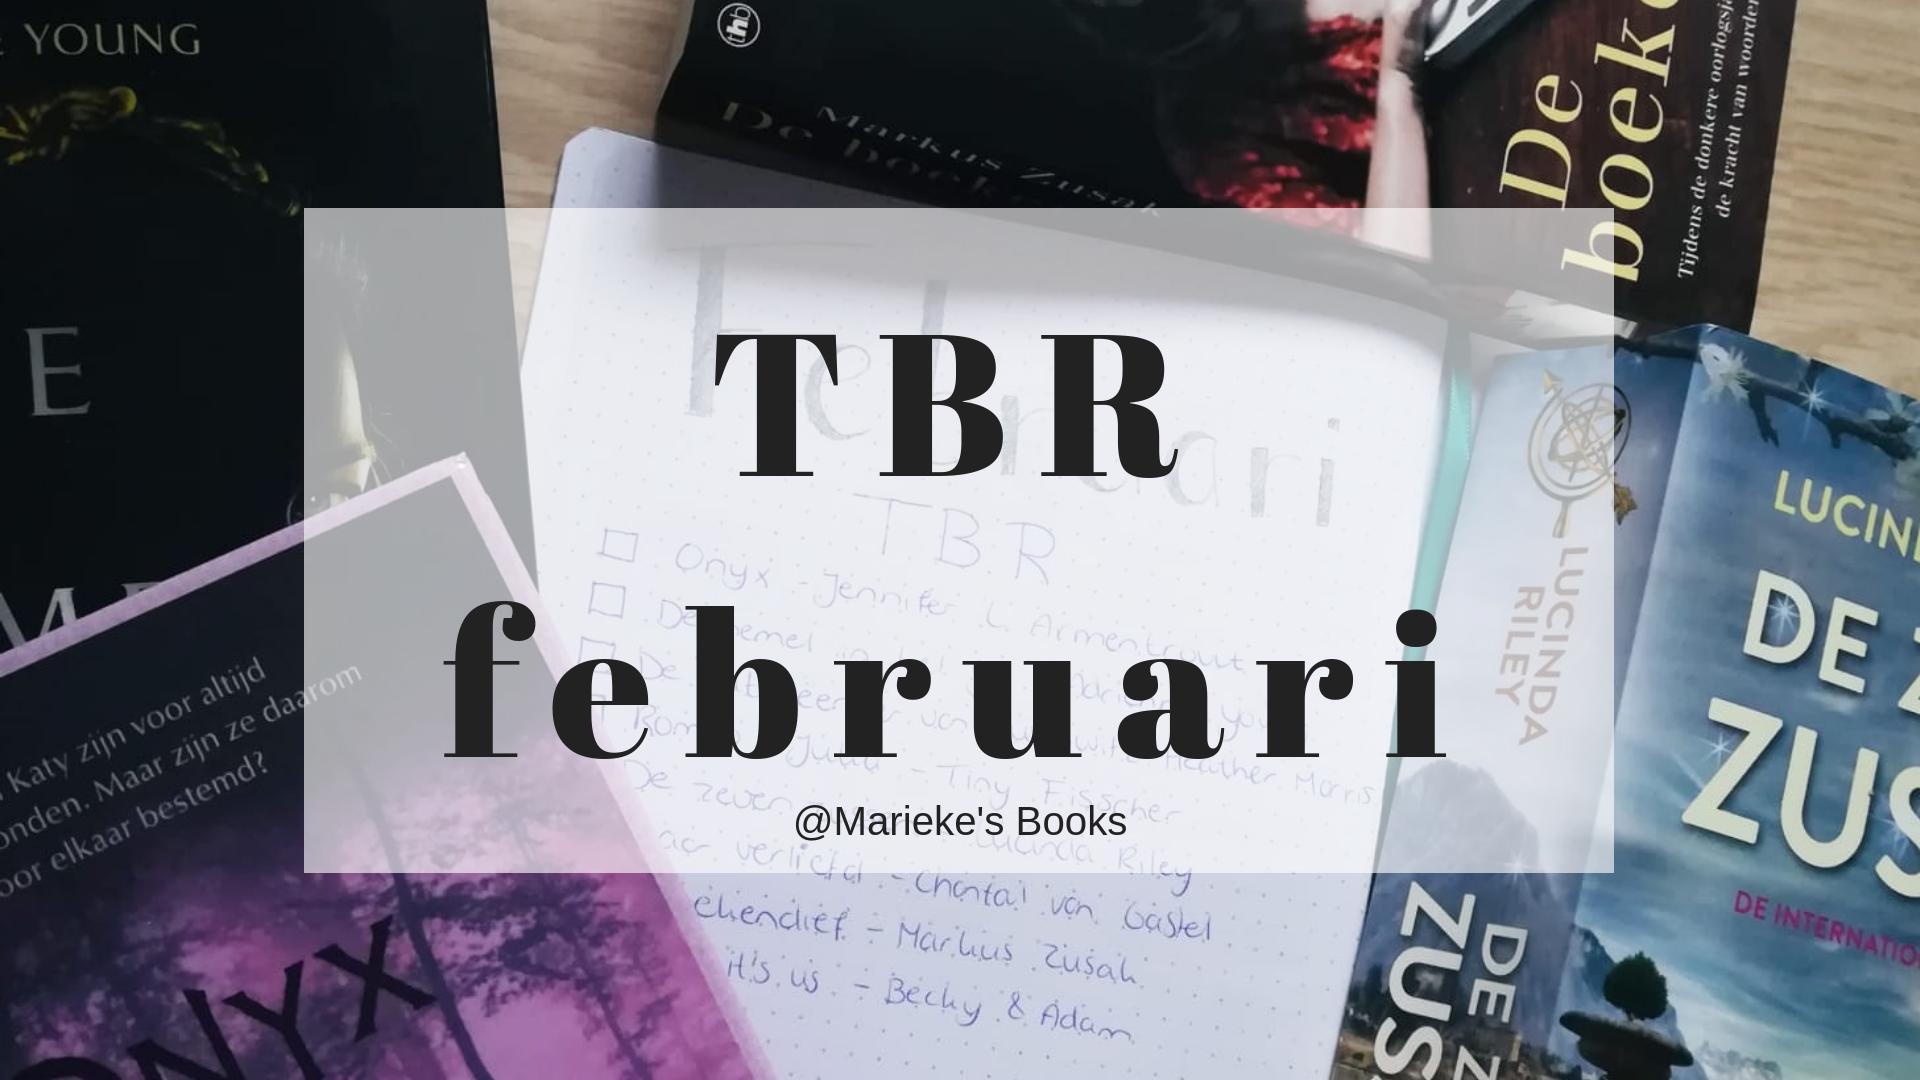 TBR februari 2019 | Marieke's Books